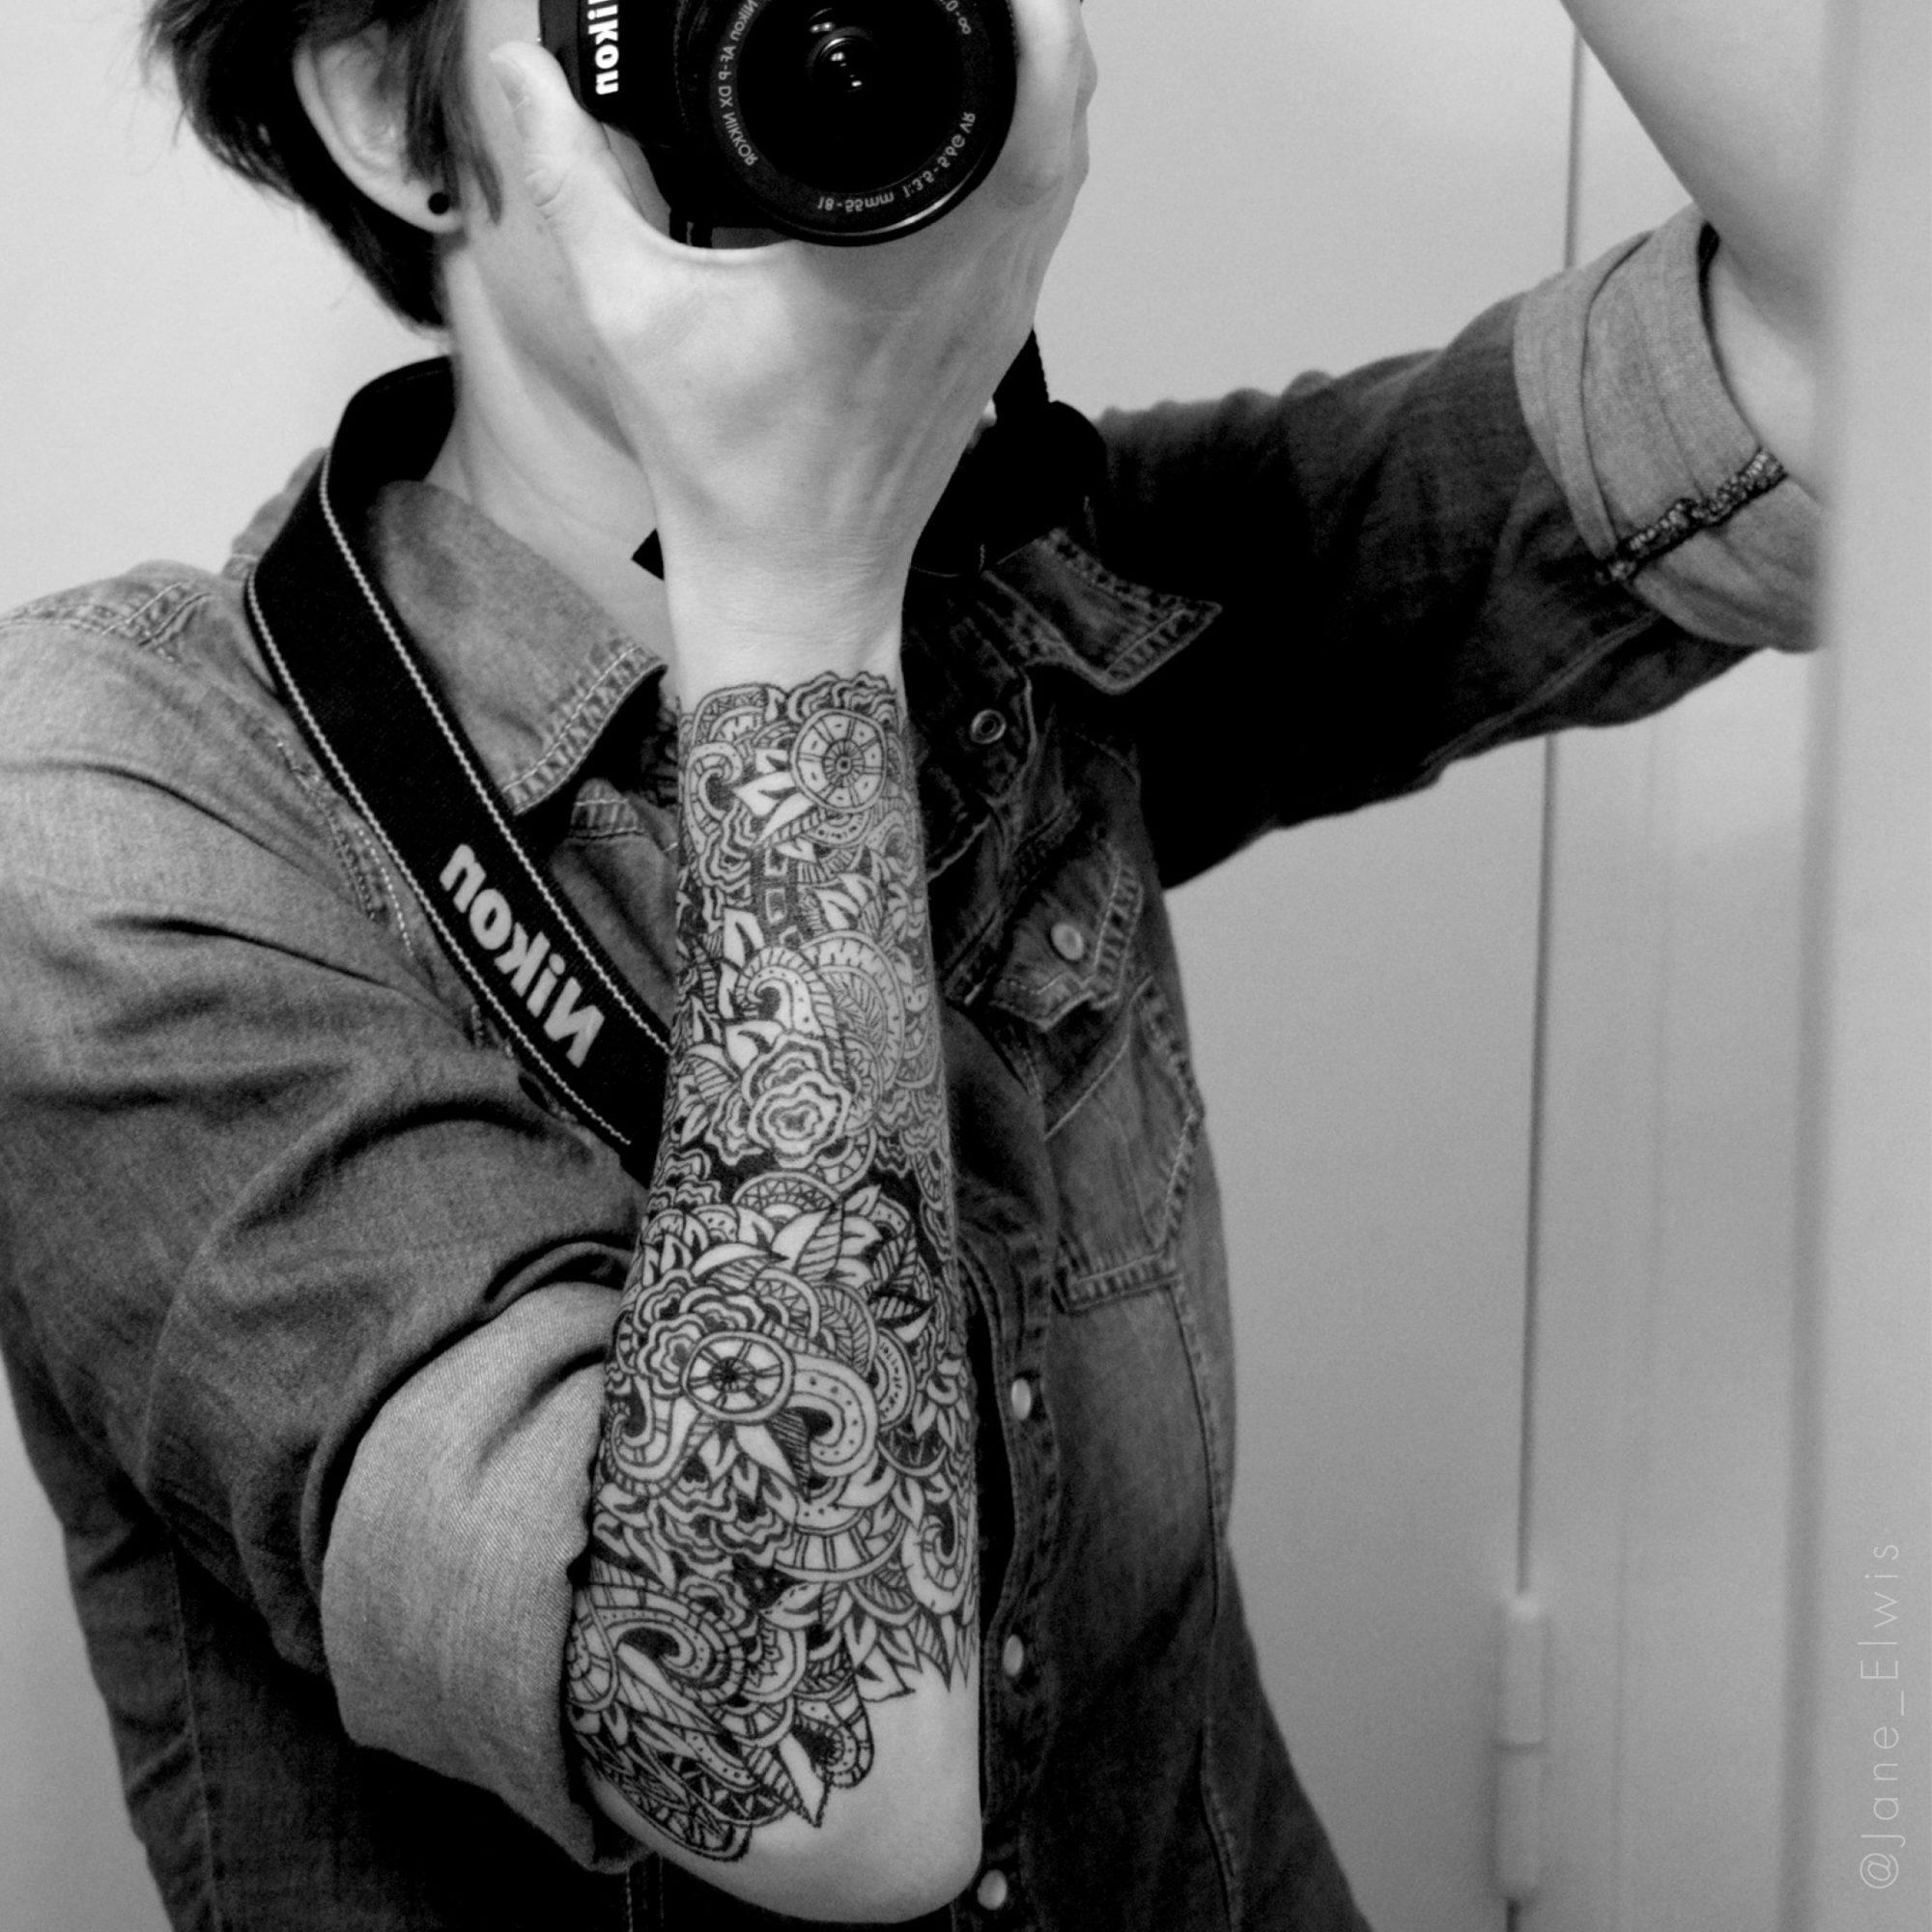 jane-elwis-tattoomania7